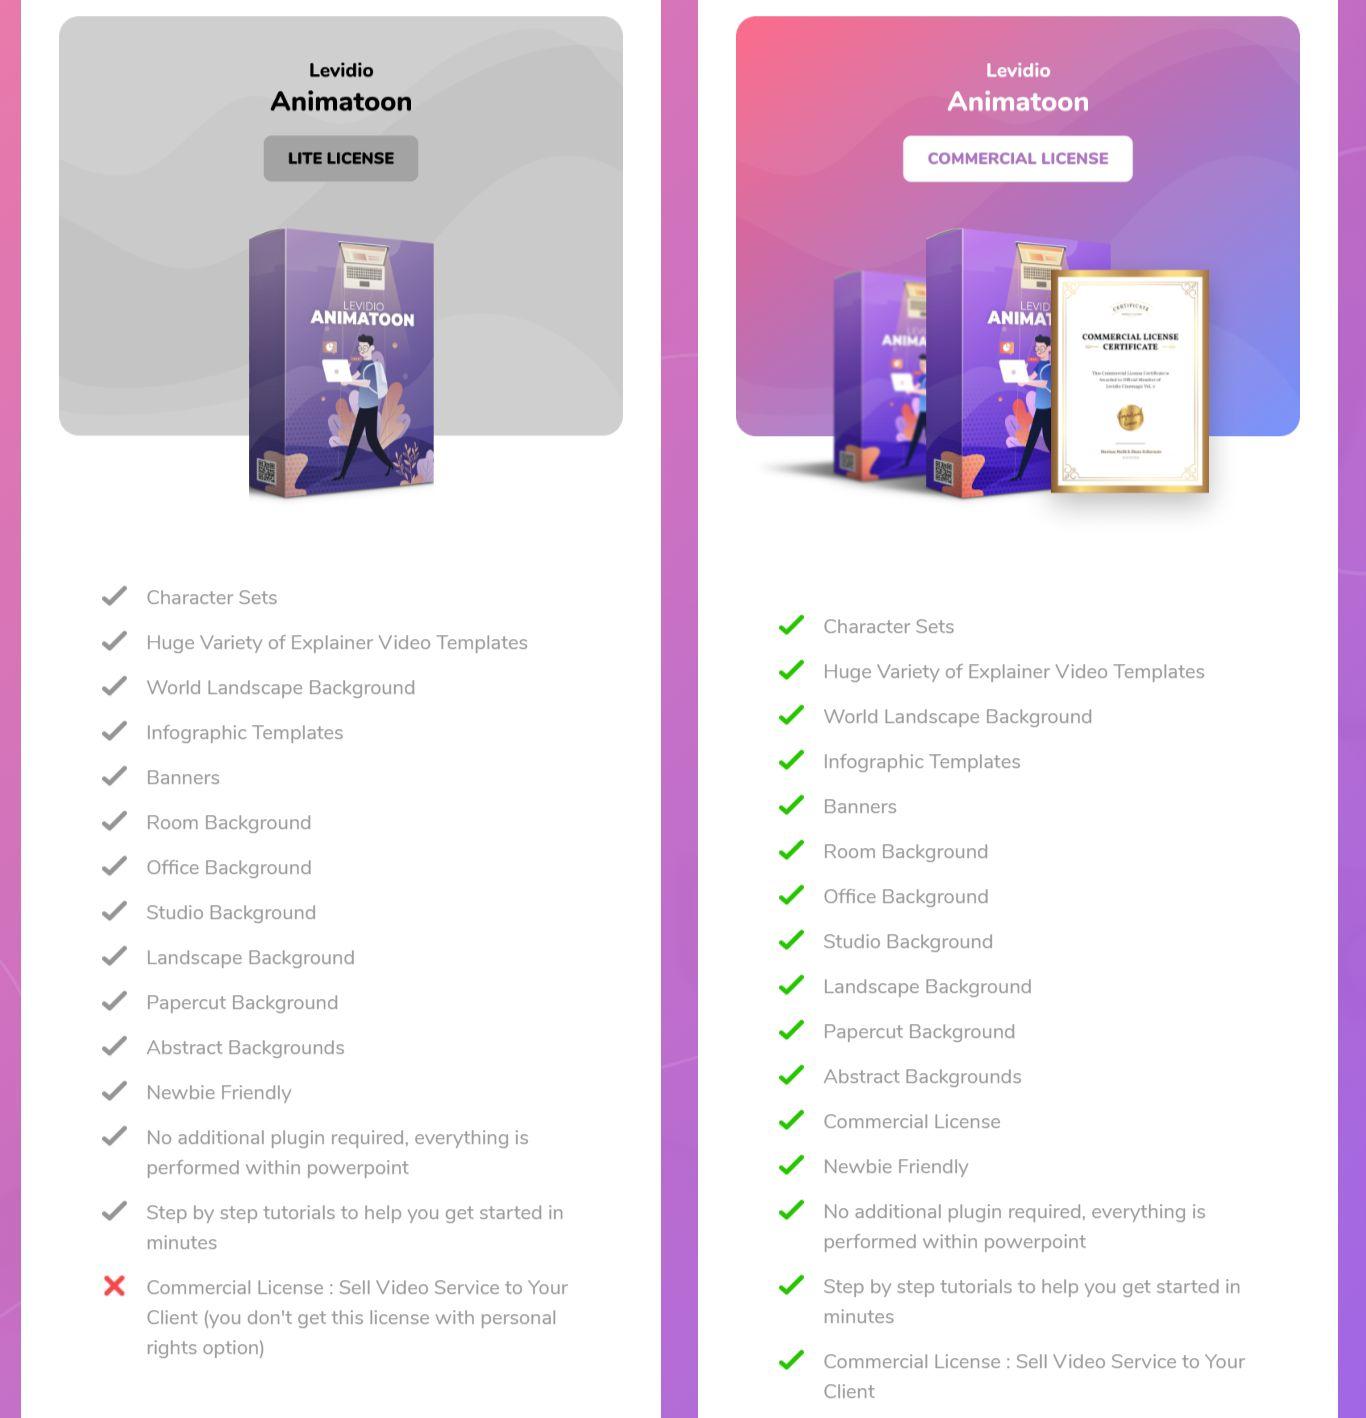 Levidio-Animatoon-Pricing